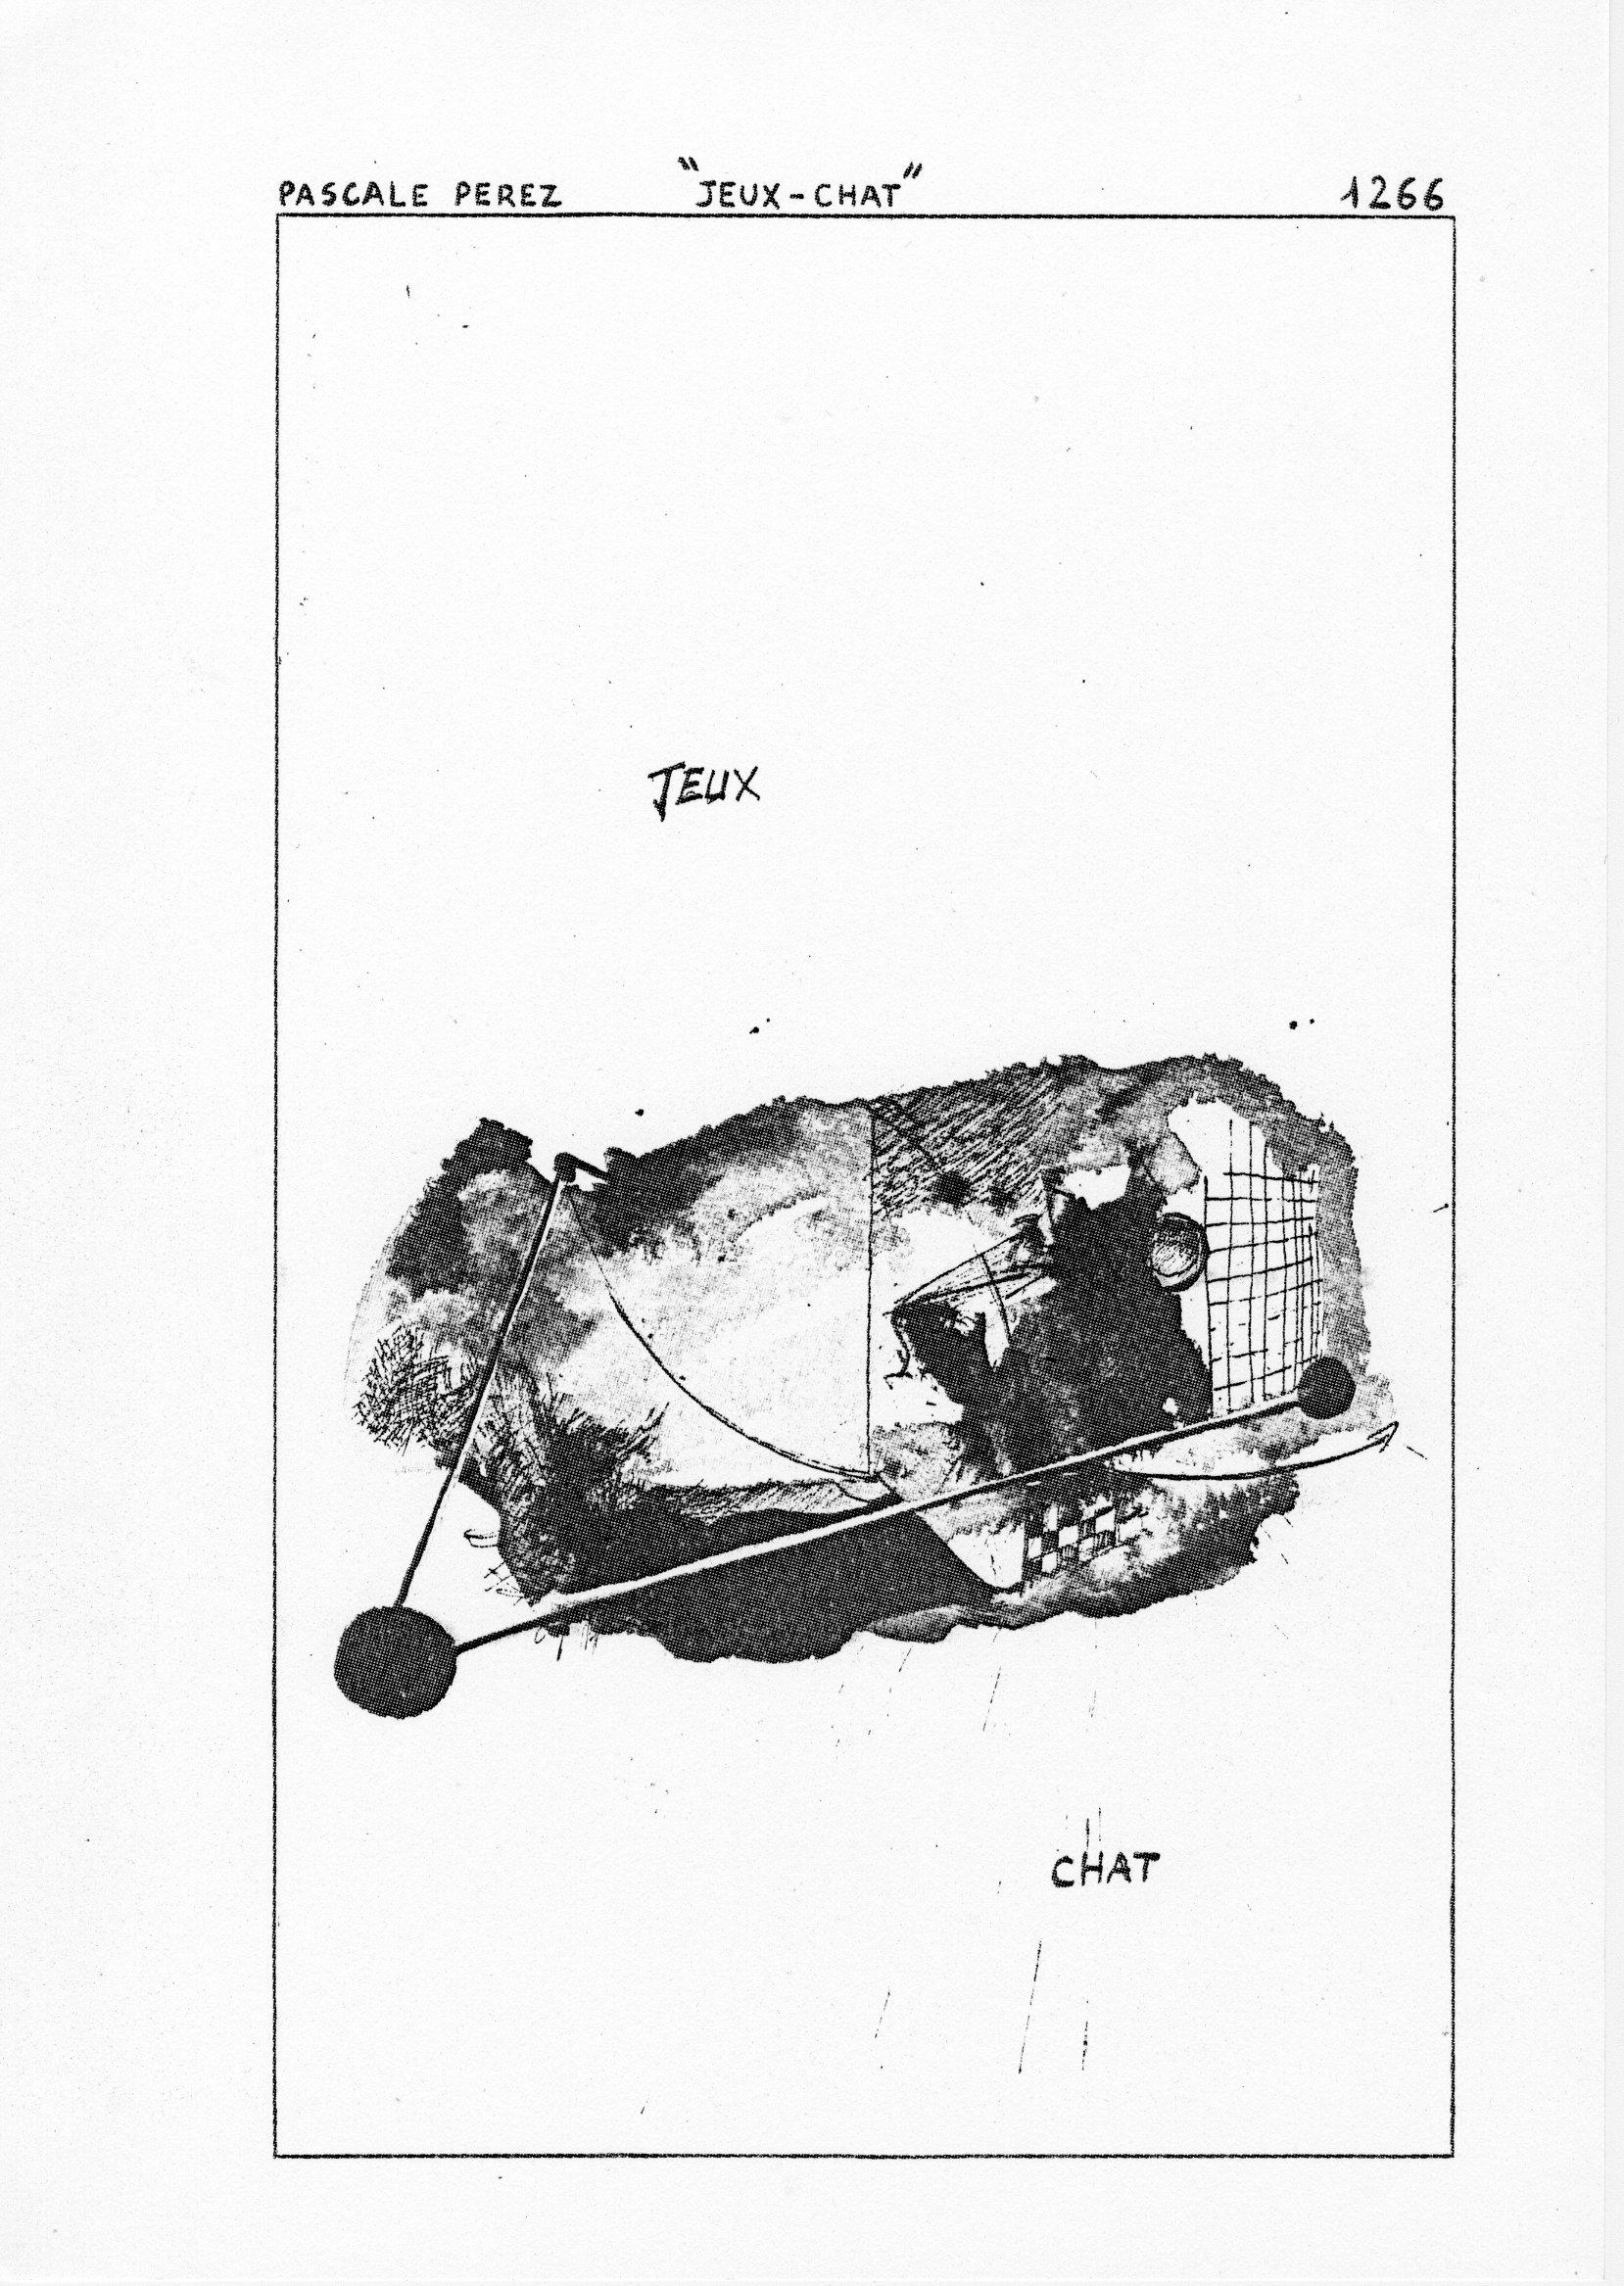 page 1266 P. PEREZ JEUX-CHAT